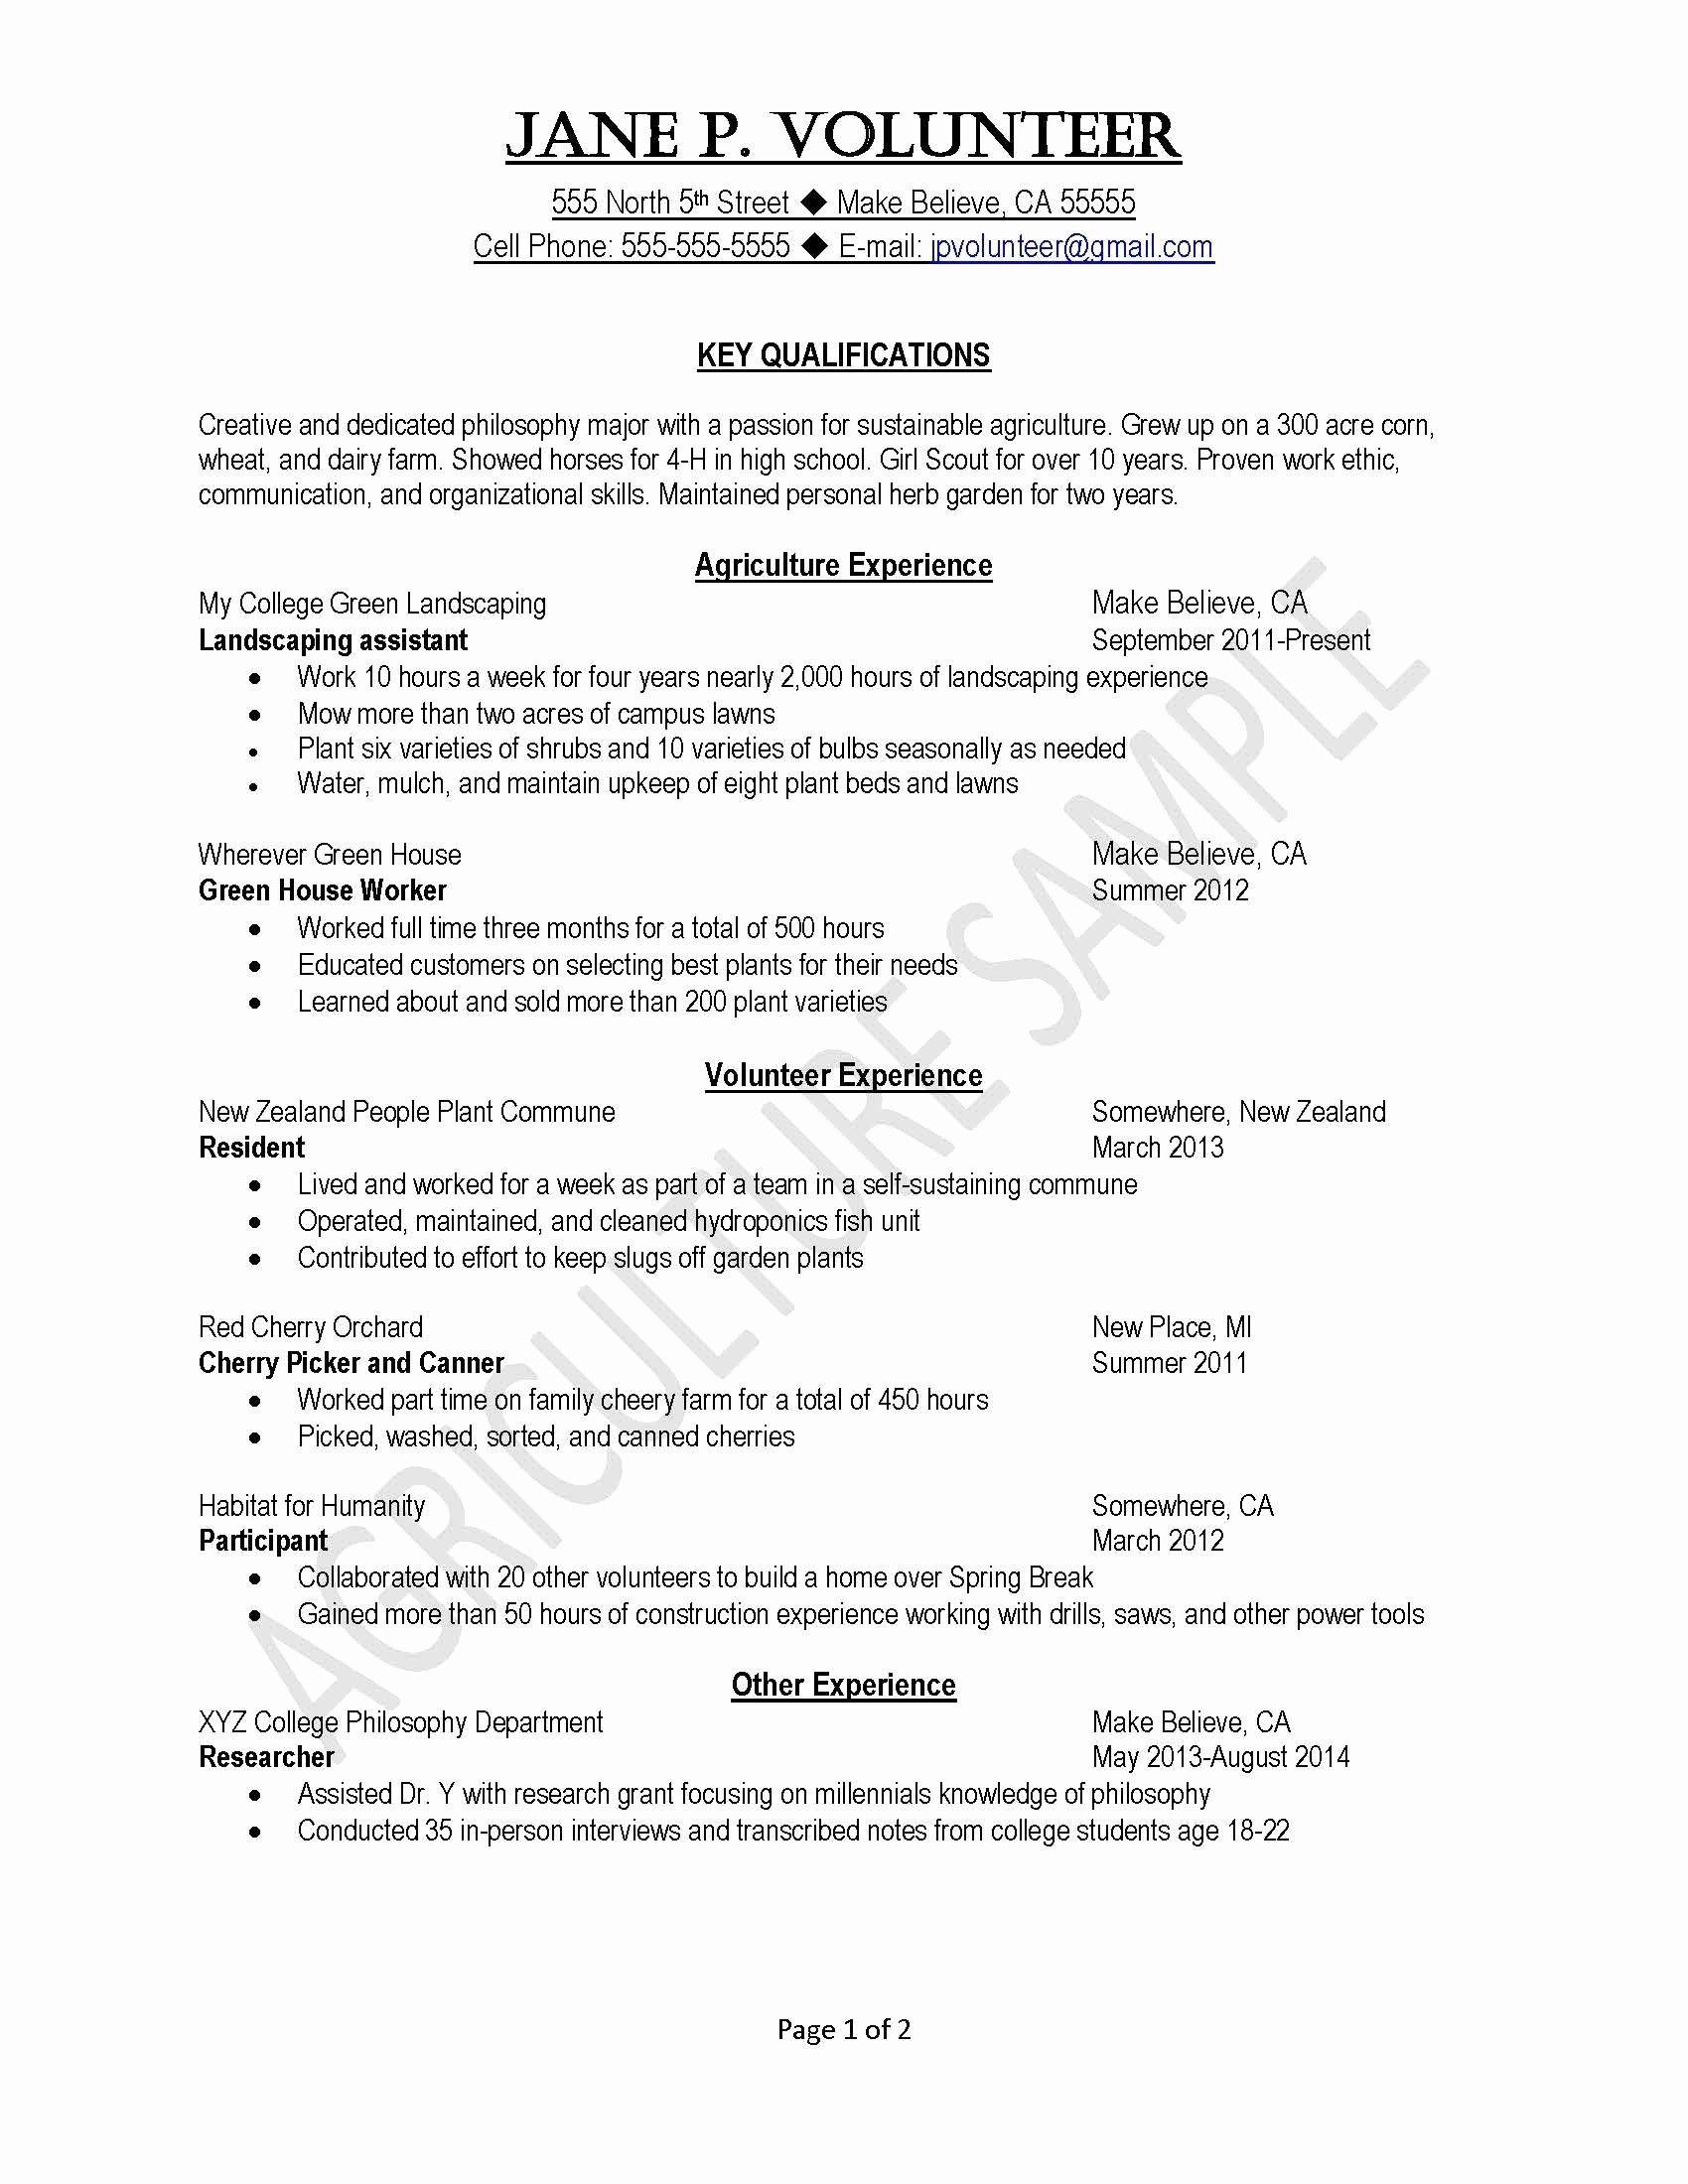 Commission Sales Agreement Template Free Elegant 009